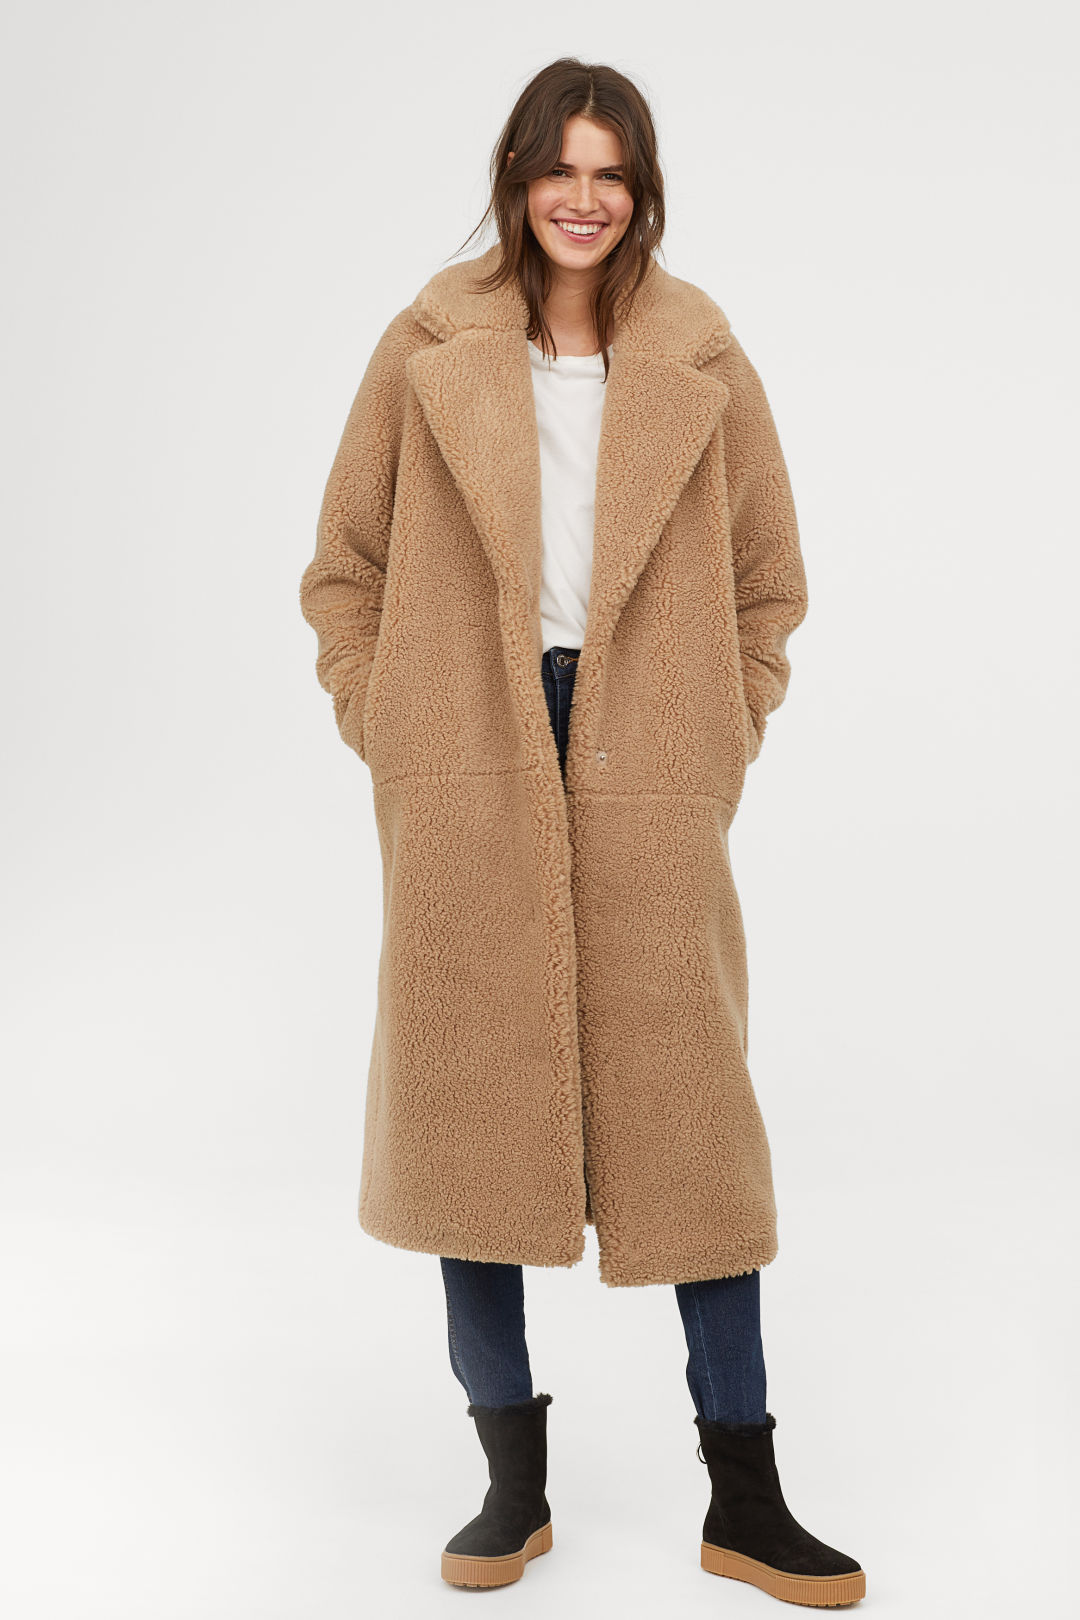 H&M Long Pile Coat